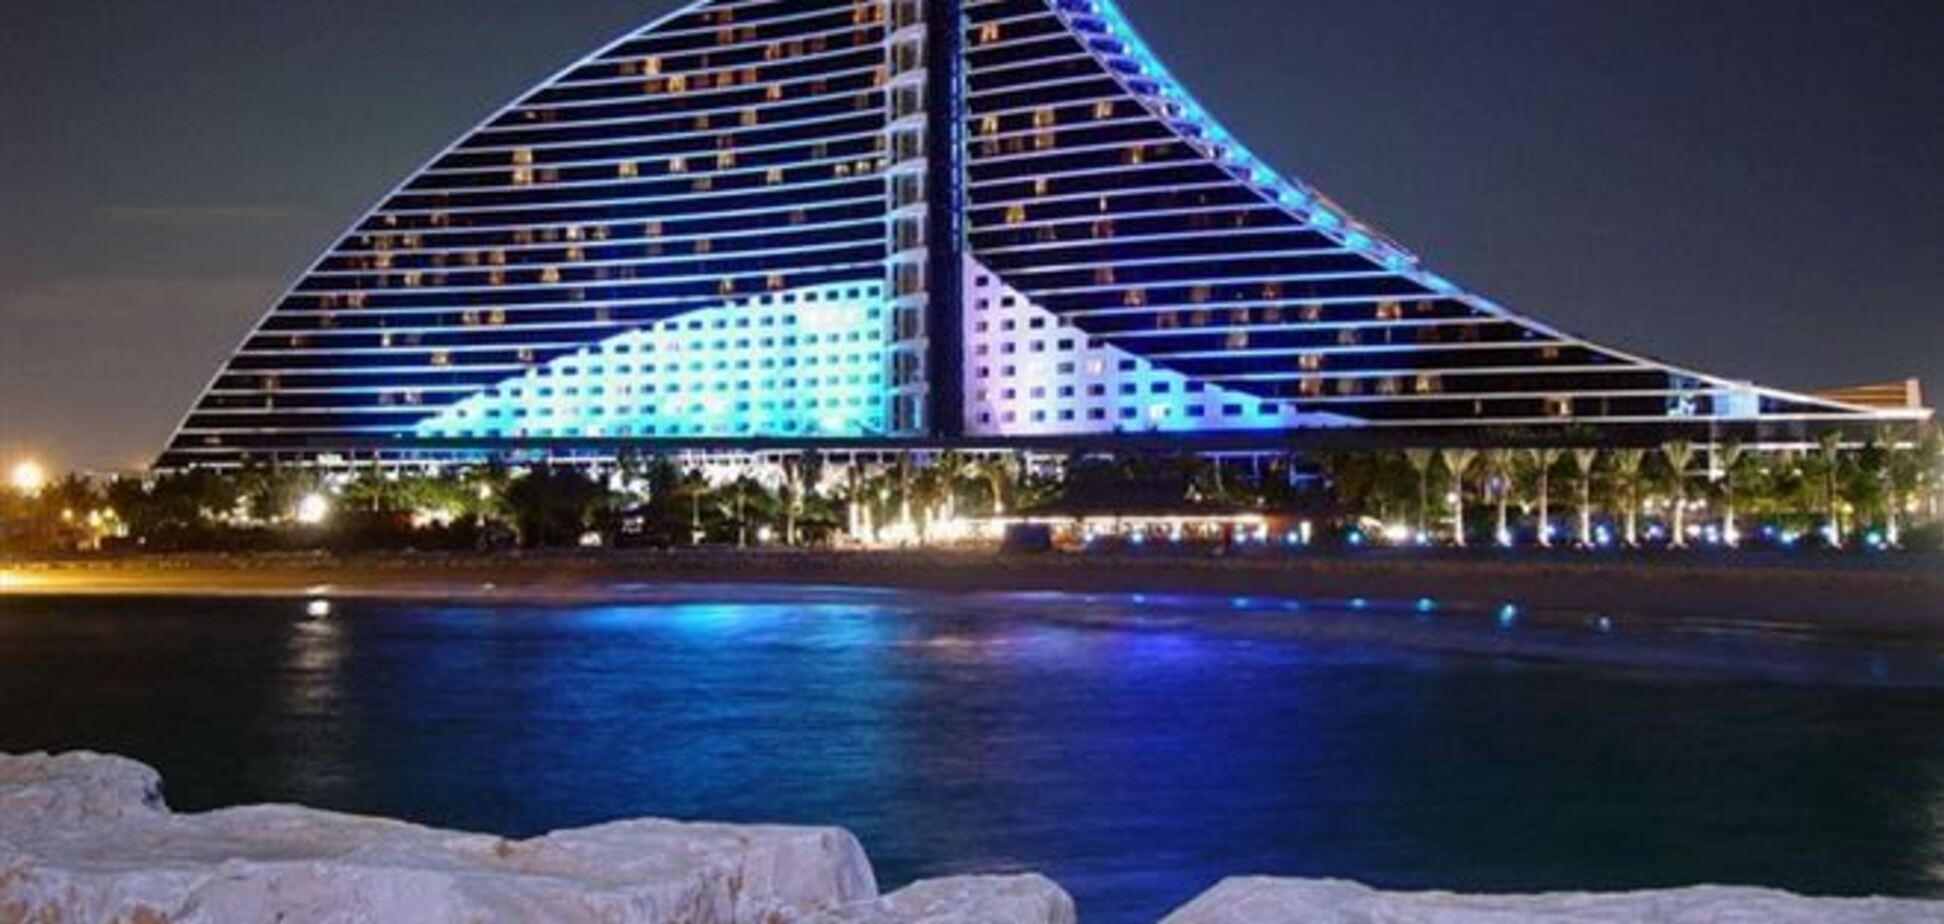 Через центр Дубая построят канал за 545 млн долларов